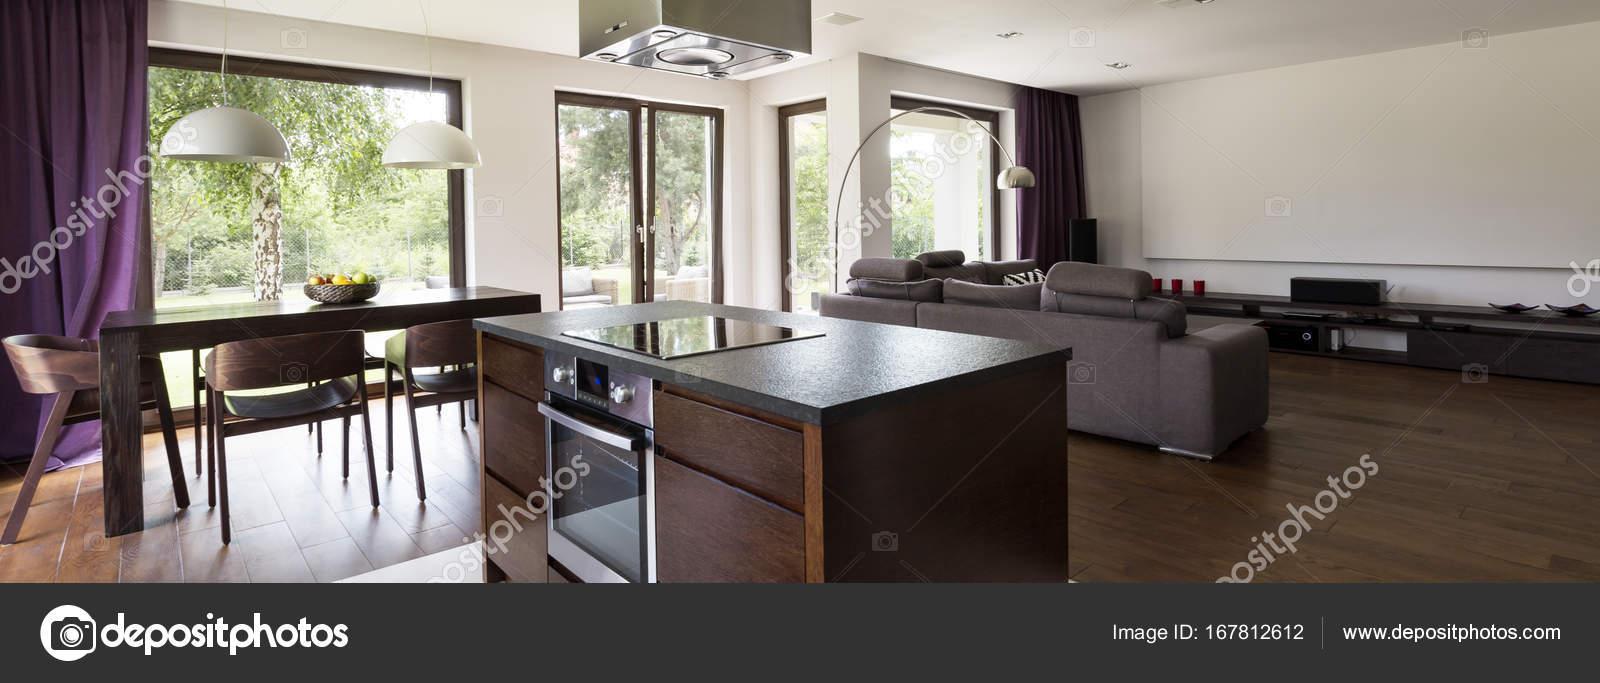 Minimalist House Design Windows on gothic stained glass windows, architecture design windows, architectural windows, interior design windows, kitchen windows,